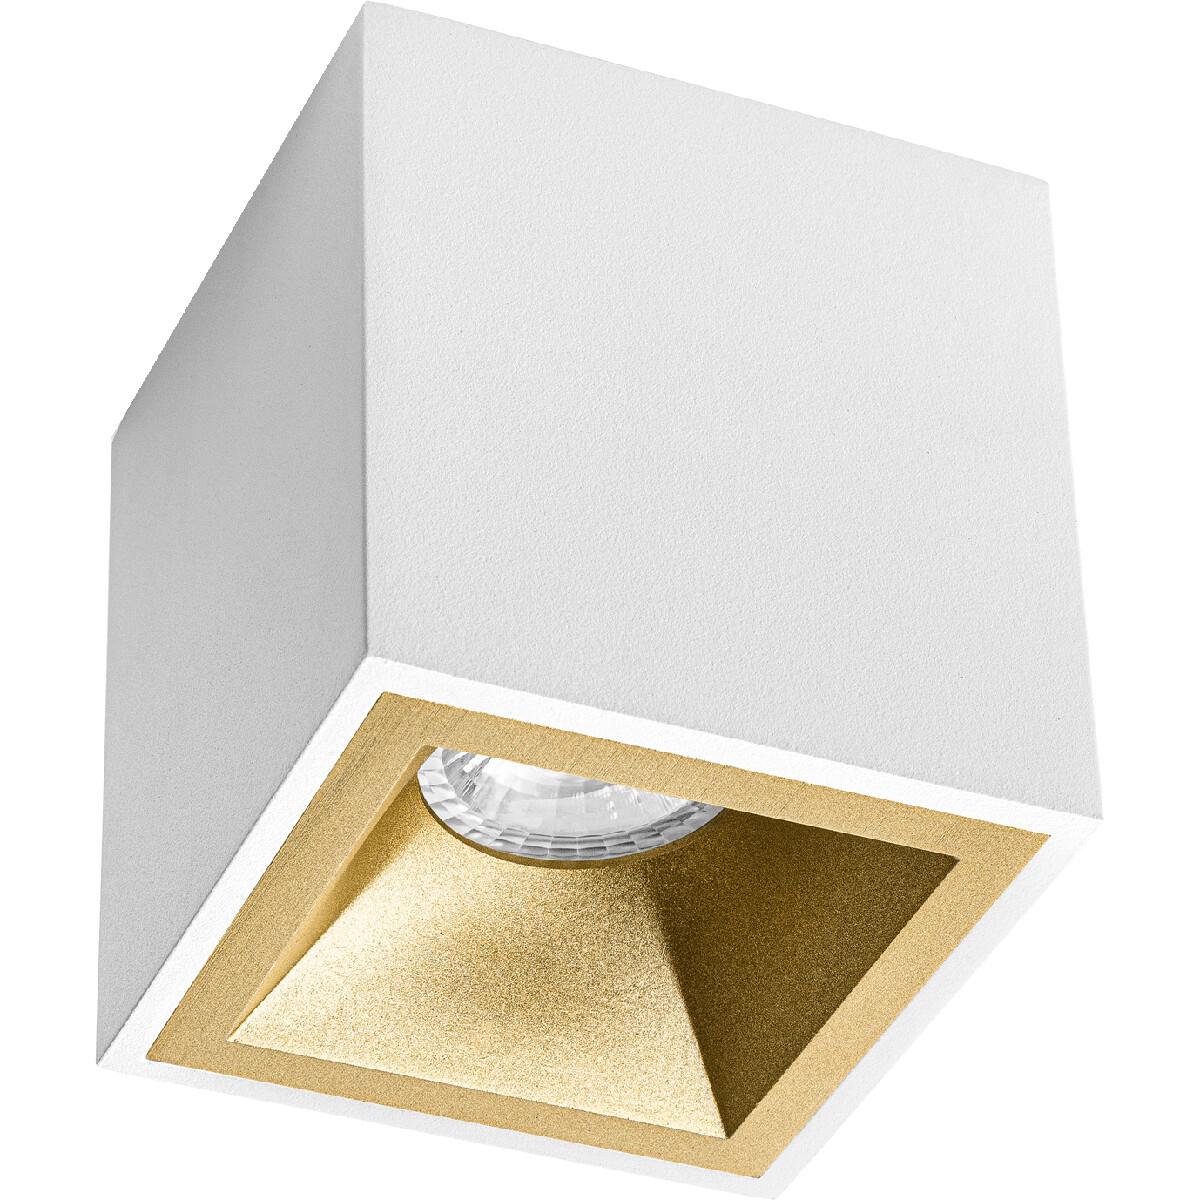 Opbouwspot GU10 - Pragmi Cliron Pro - Opbouw Vierkant - Mat Wit/Goud - Aluminium - Verdiept - 90mm